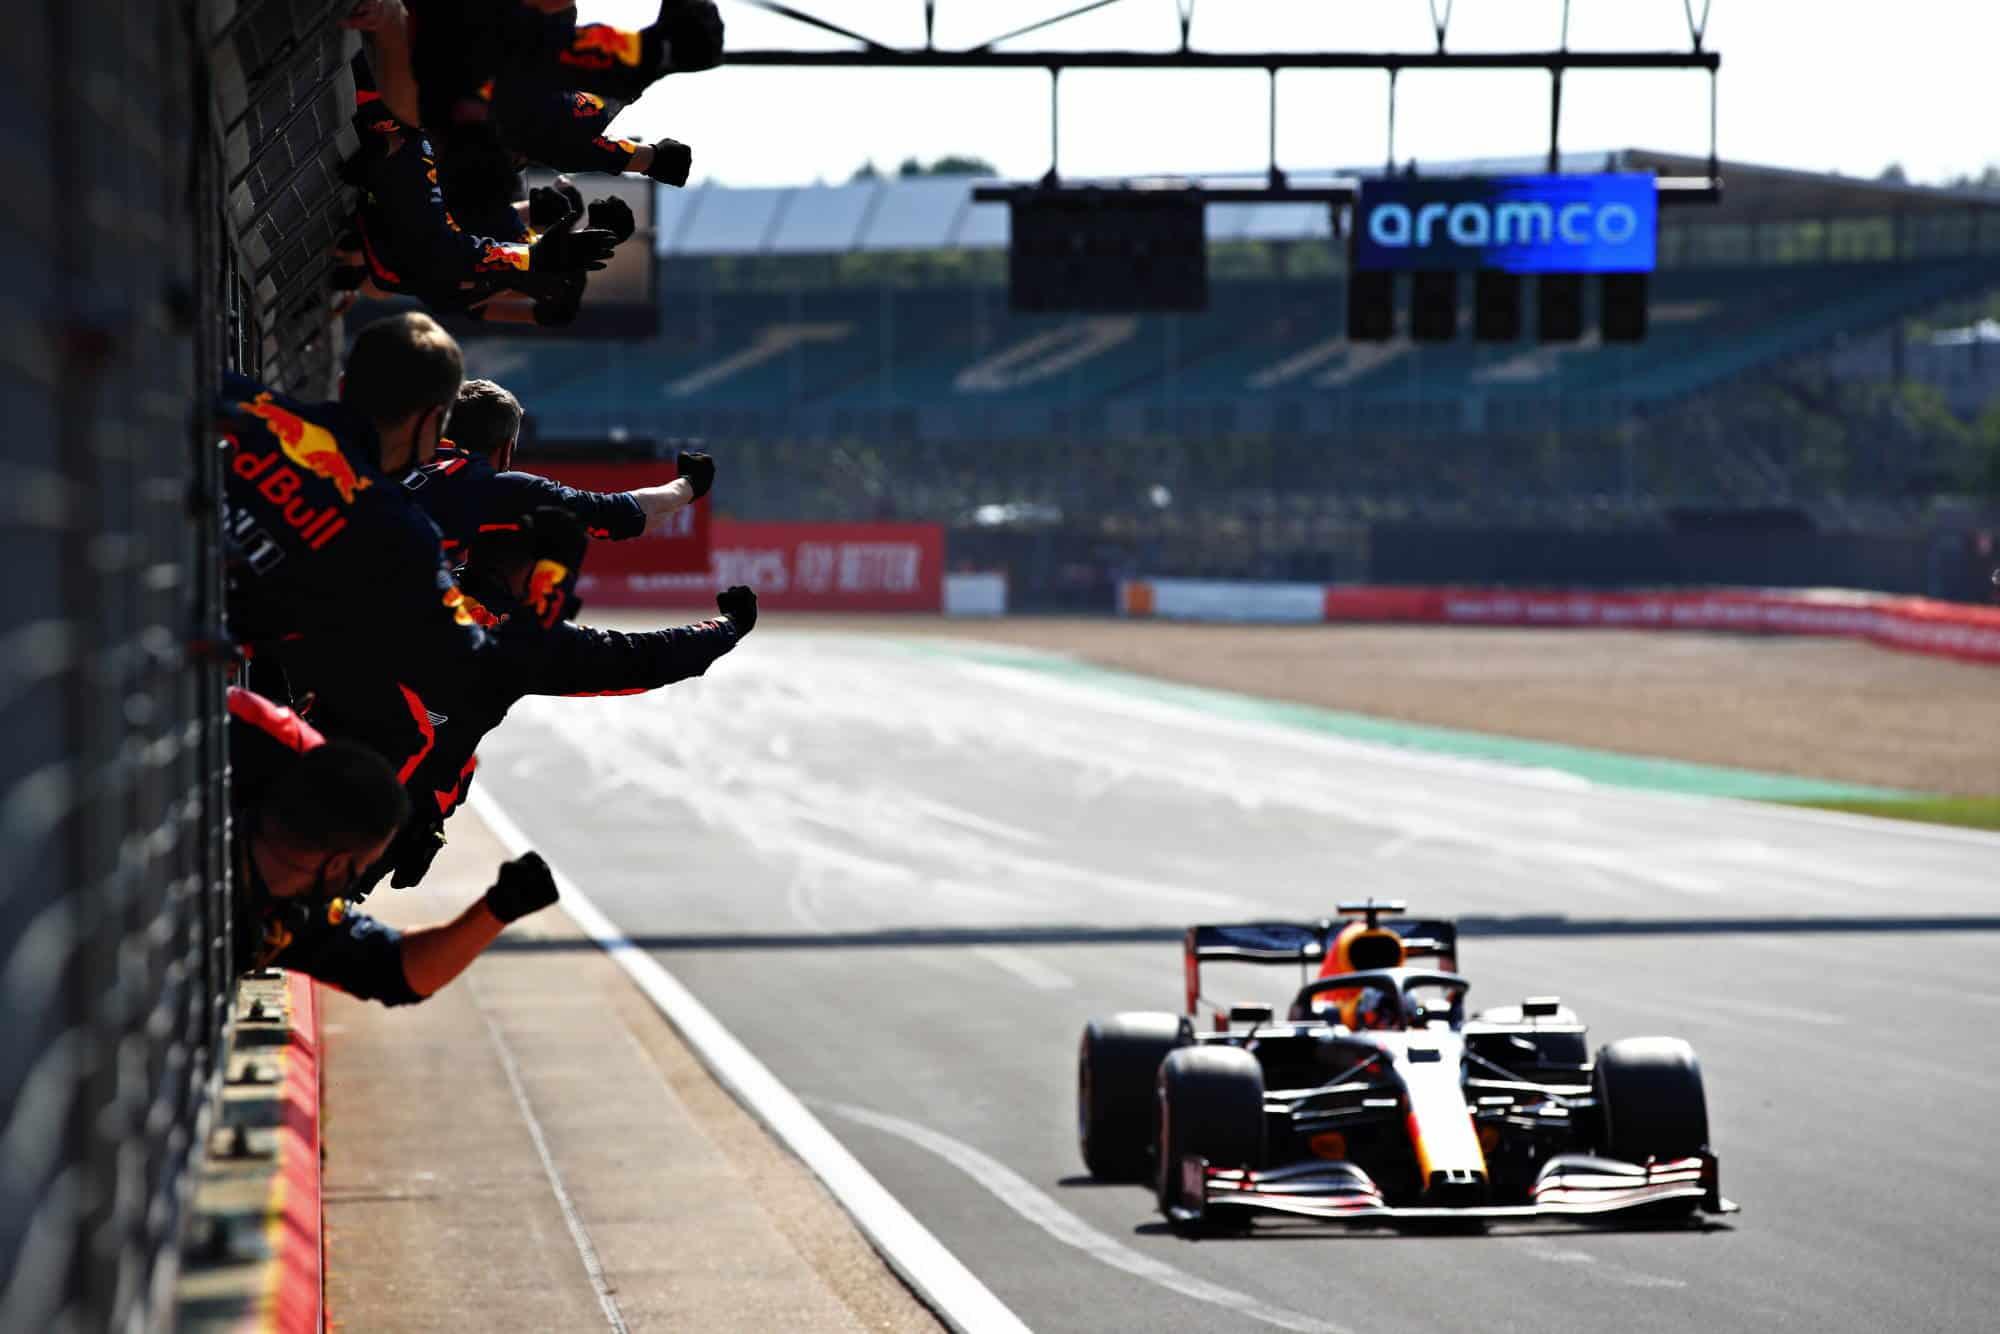 2020 70th Anniversary GP finish line Verstappen Hamilton Bottas Photo Red Bull